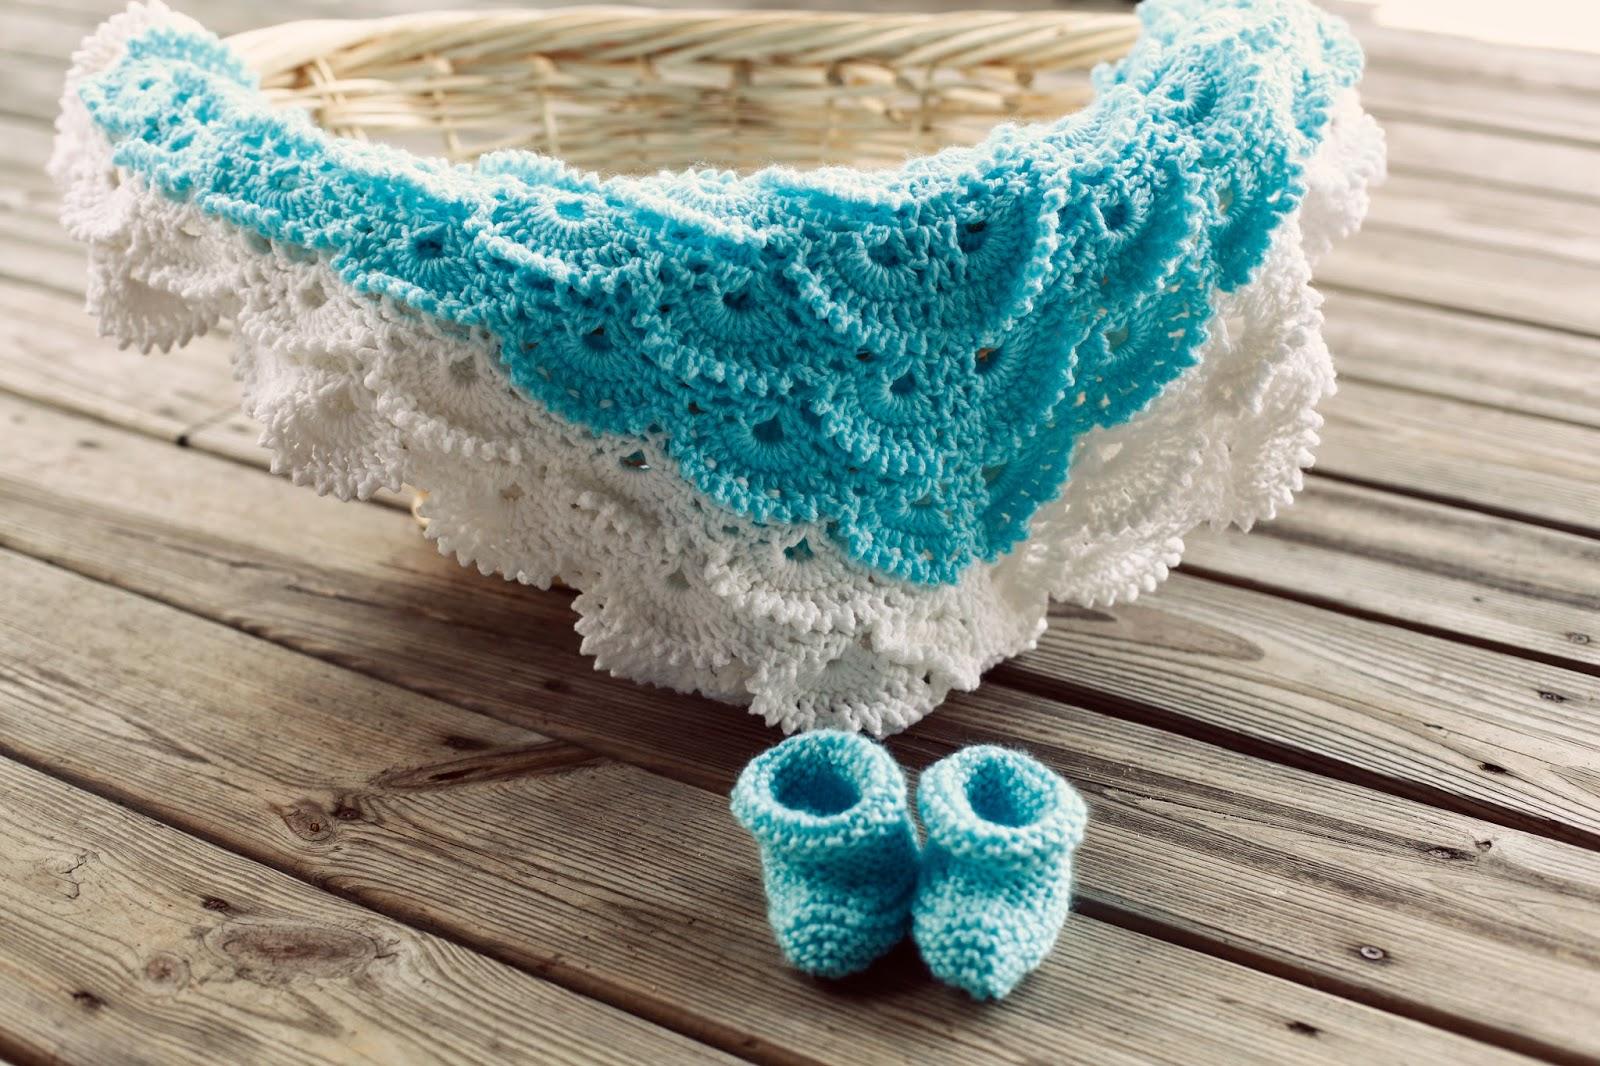 Bizzy Crochet: August 2014